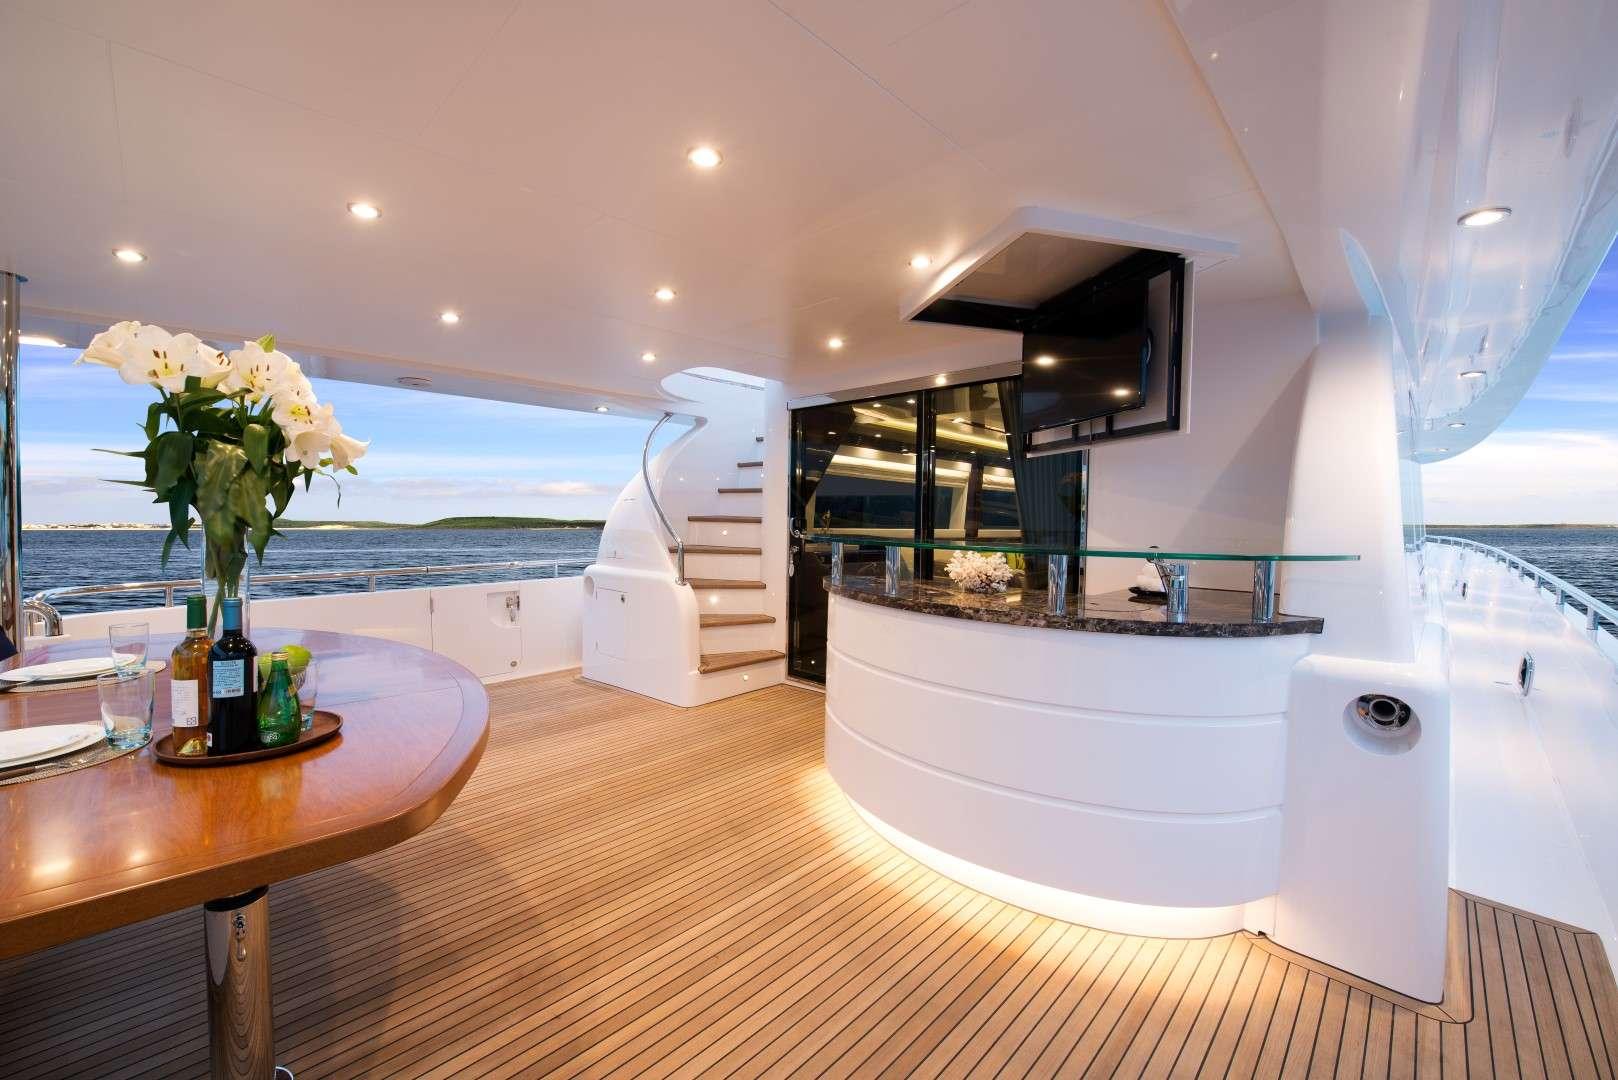 onboard - Aqua Motor Yacht - yacht for rent in dubai